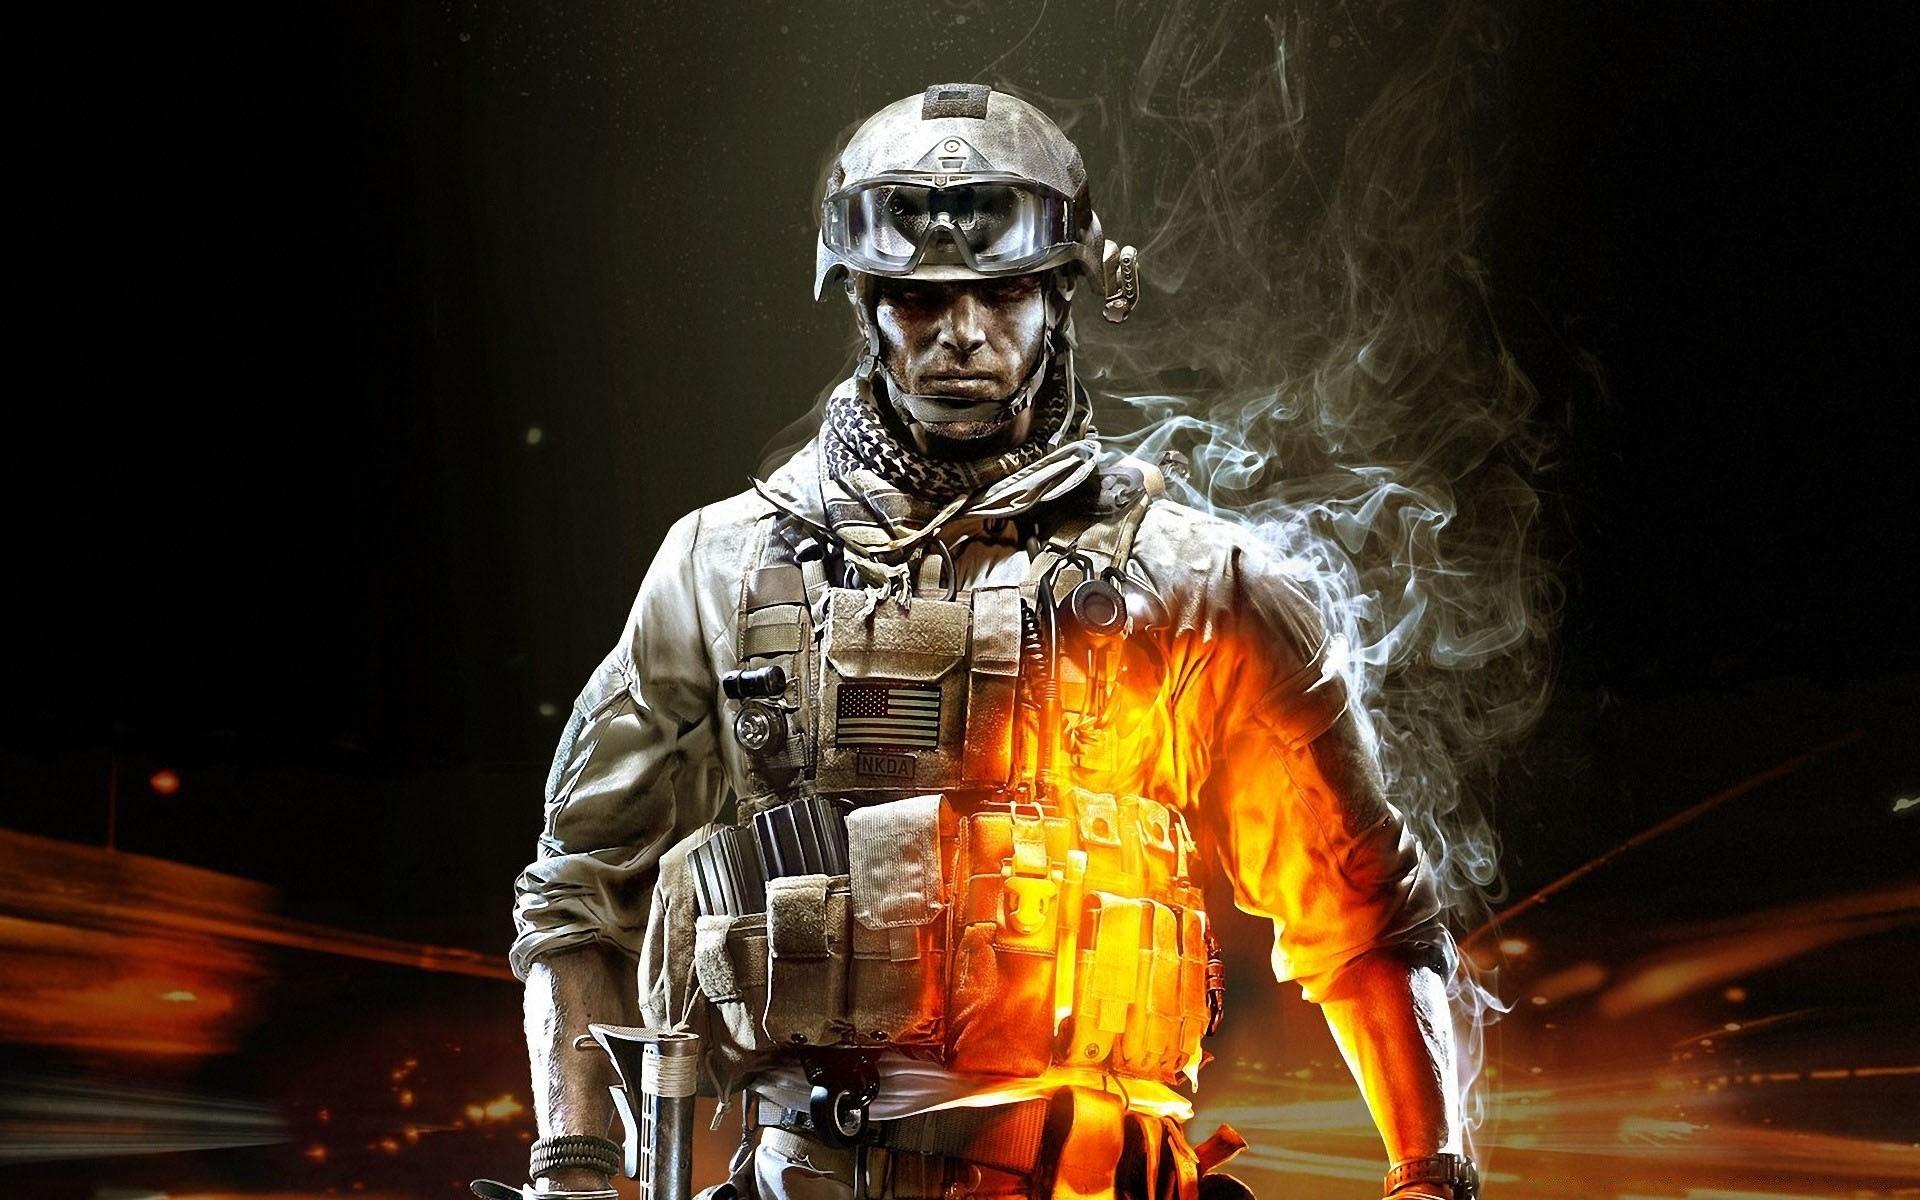 В ролике сравнили графику Battlefield 2042, Battlefield 3 и Bad Company 2 на одинаковых картах